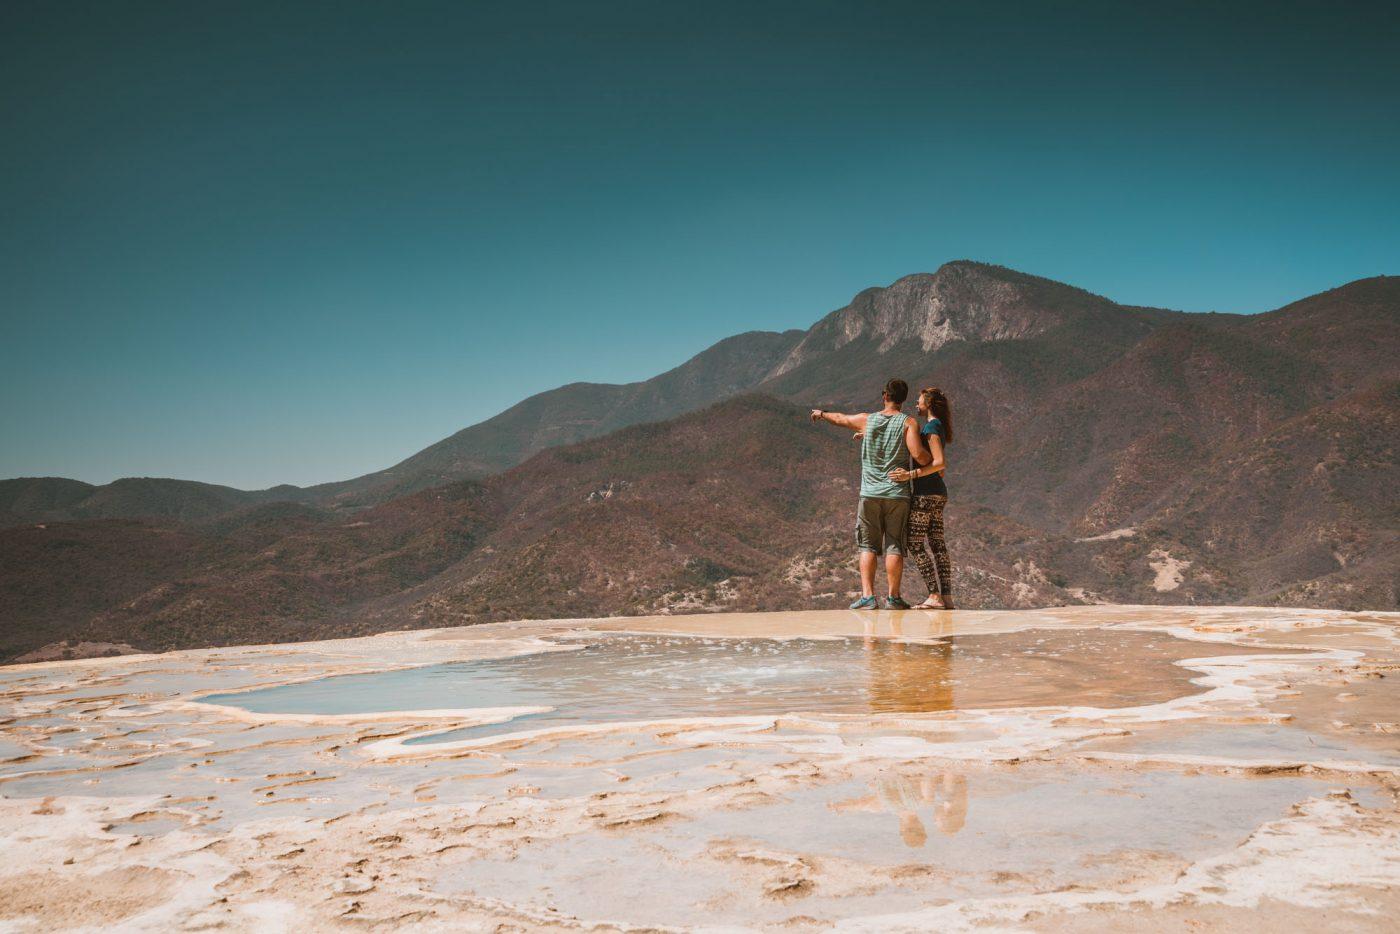 Admiring the views of Hierve el Agua